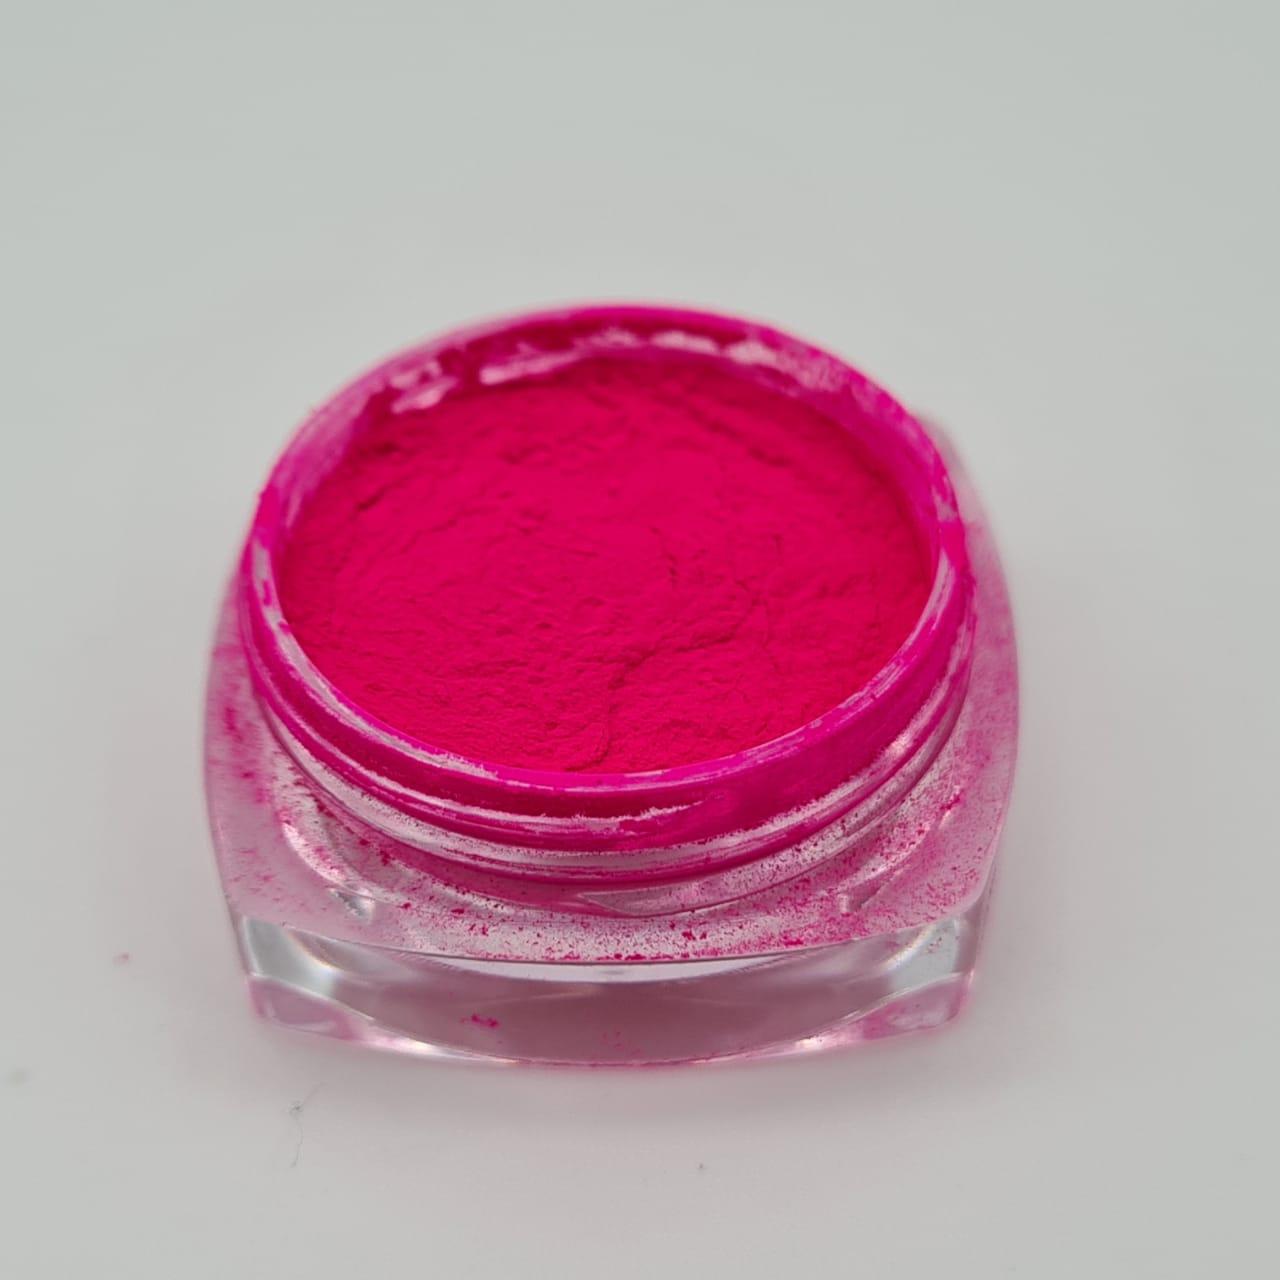 Pó NEON Fluorescente - PINK